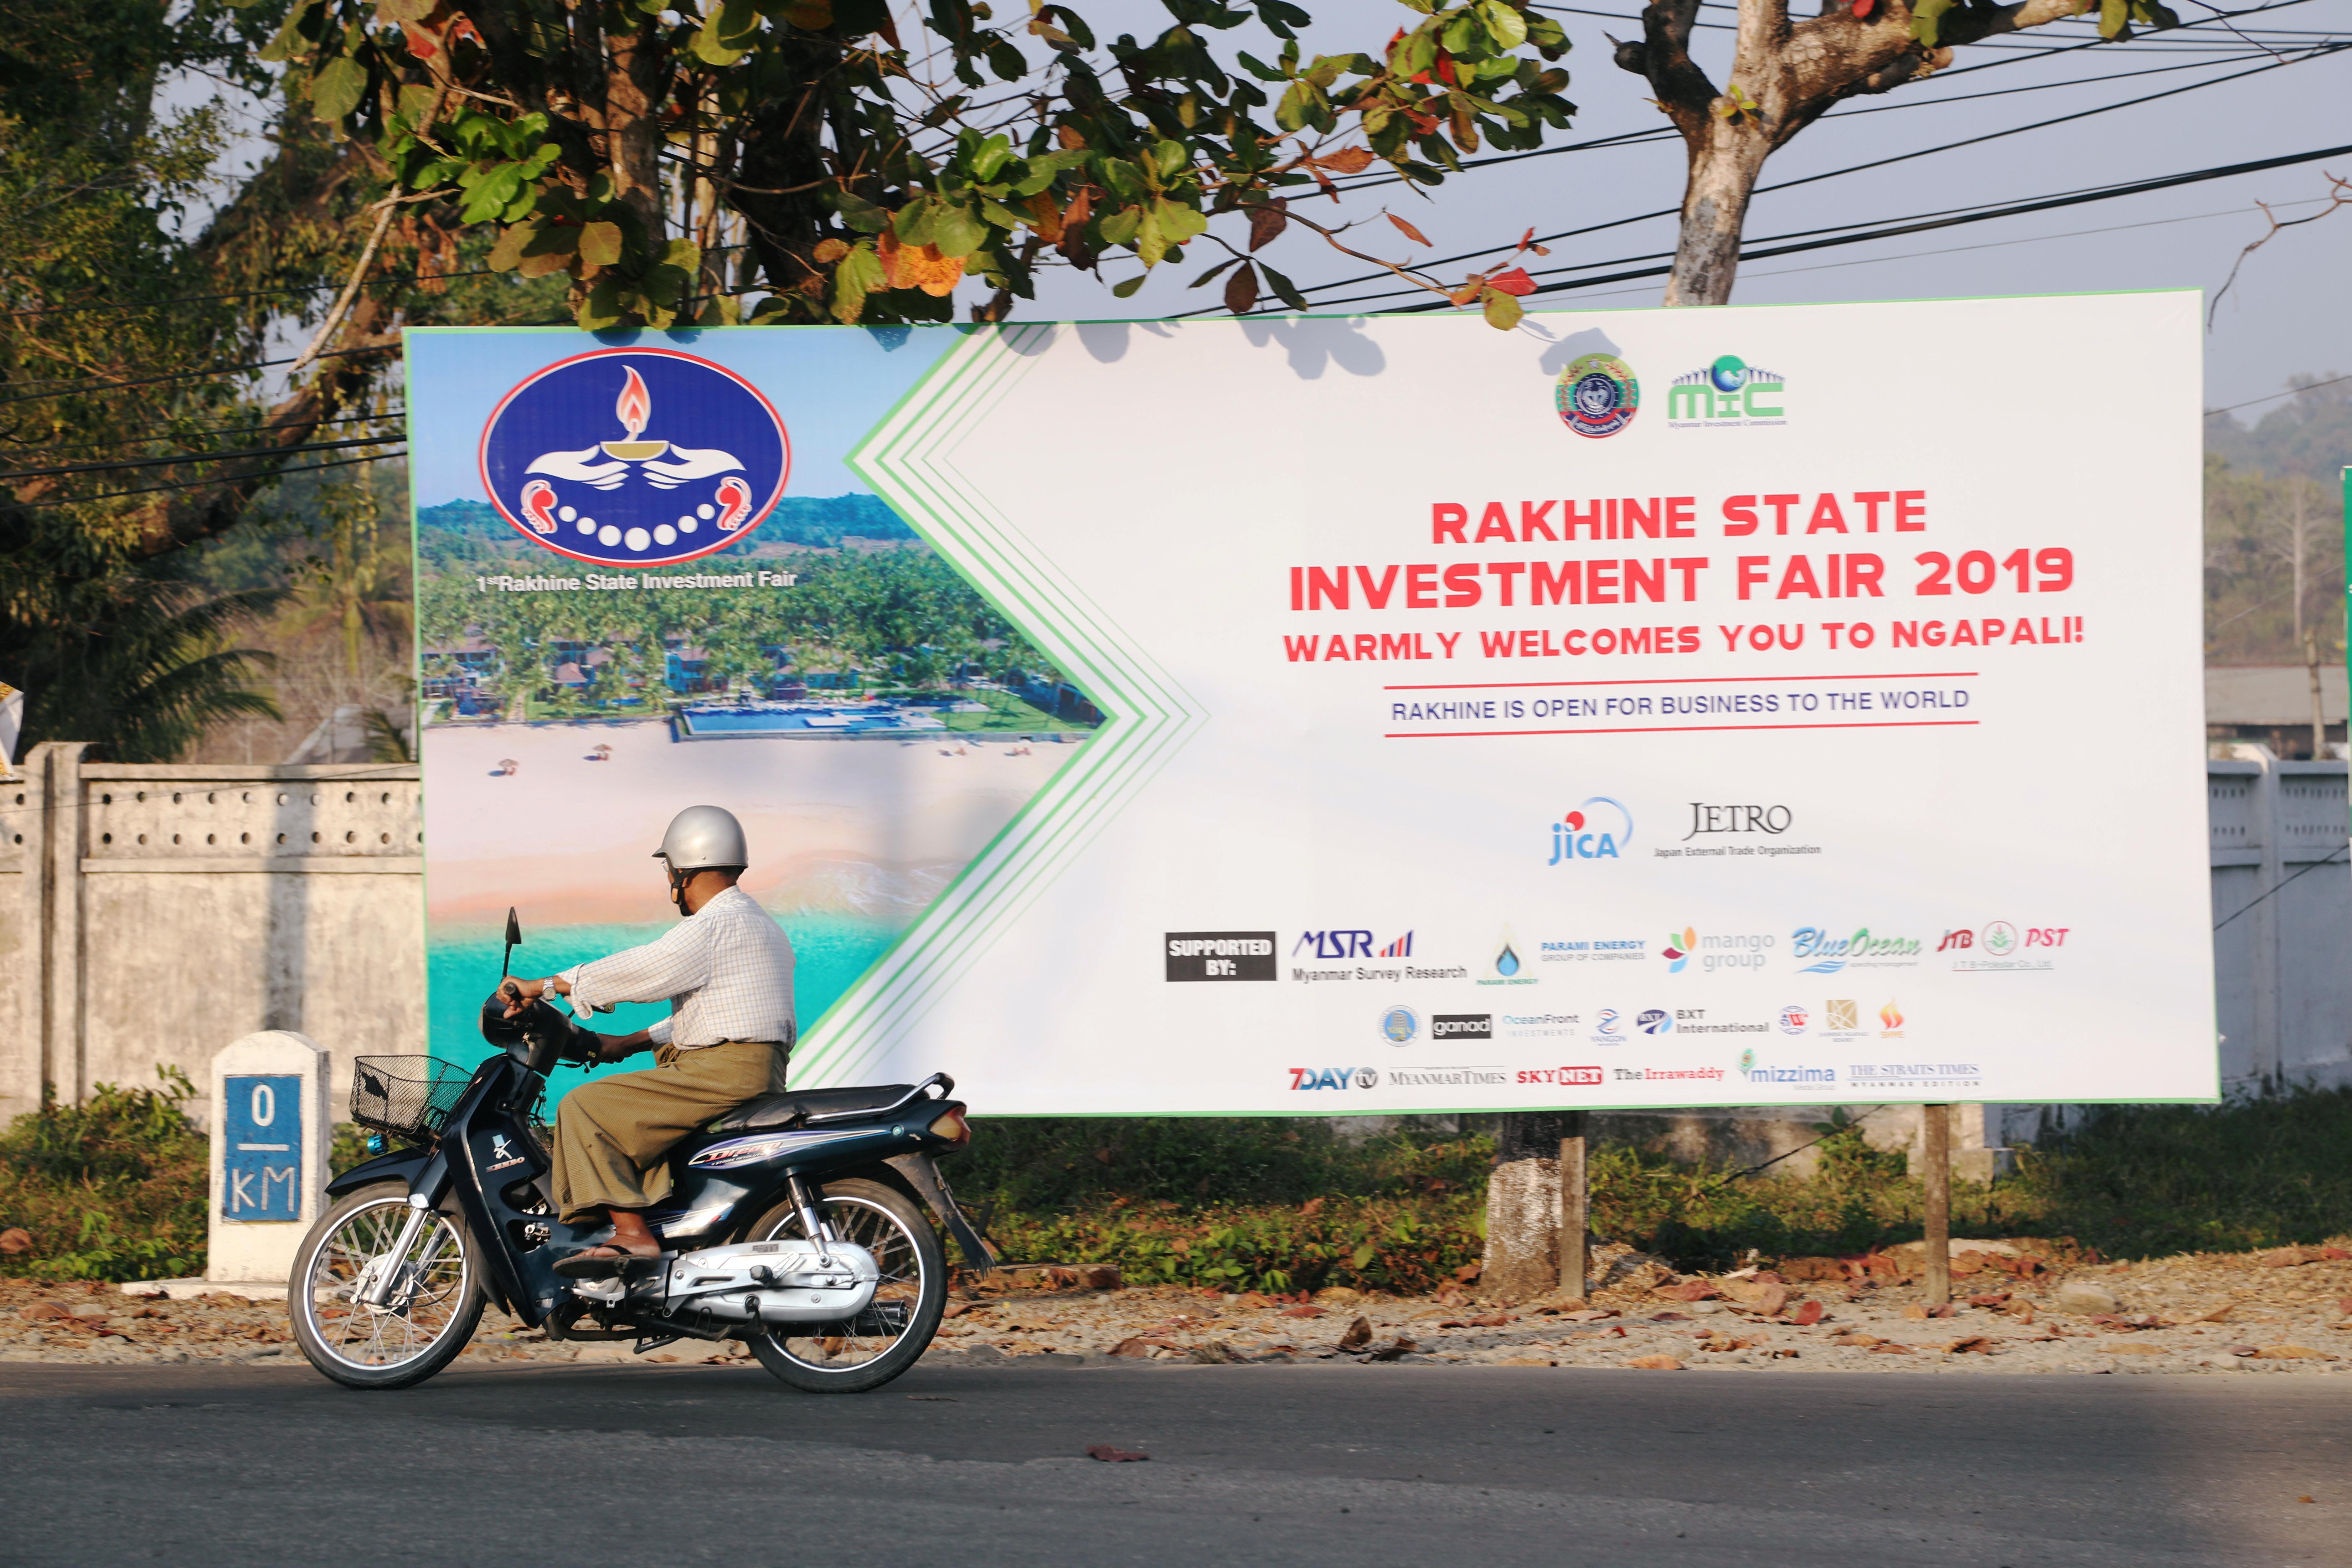 'Tarnished image': Myanmar touts troubled Rakhine as investment destination